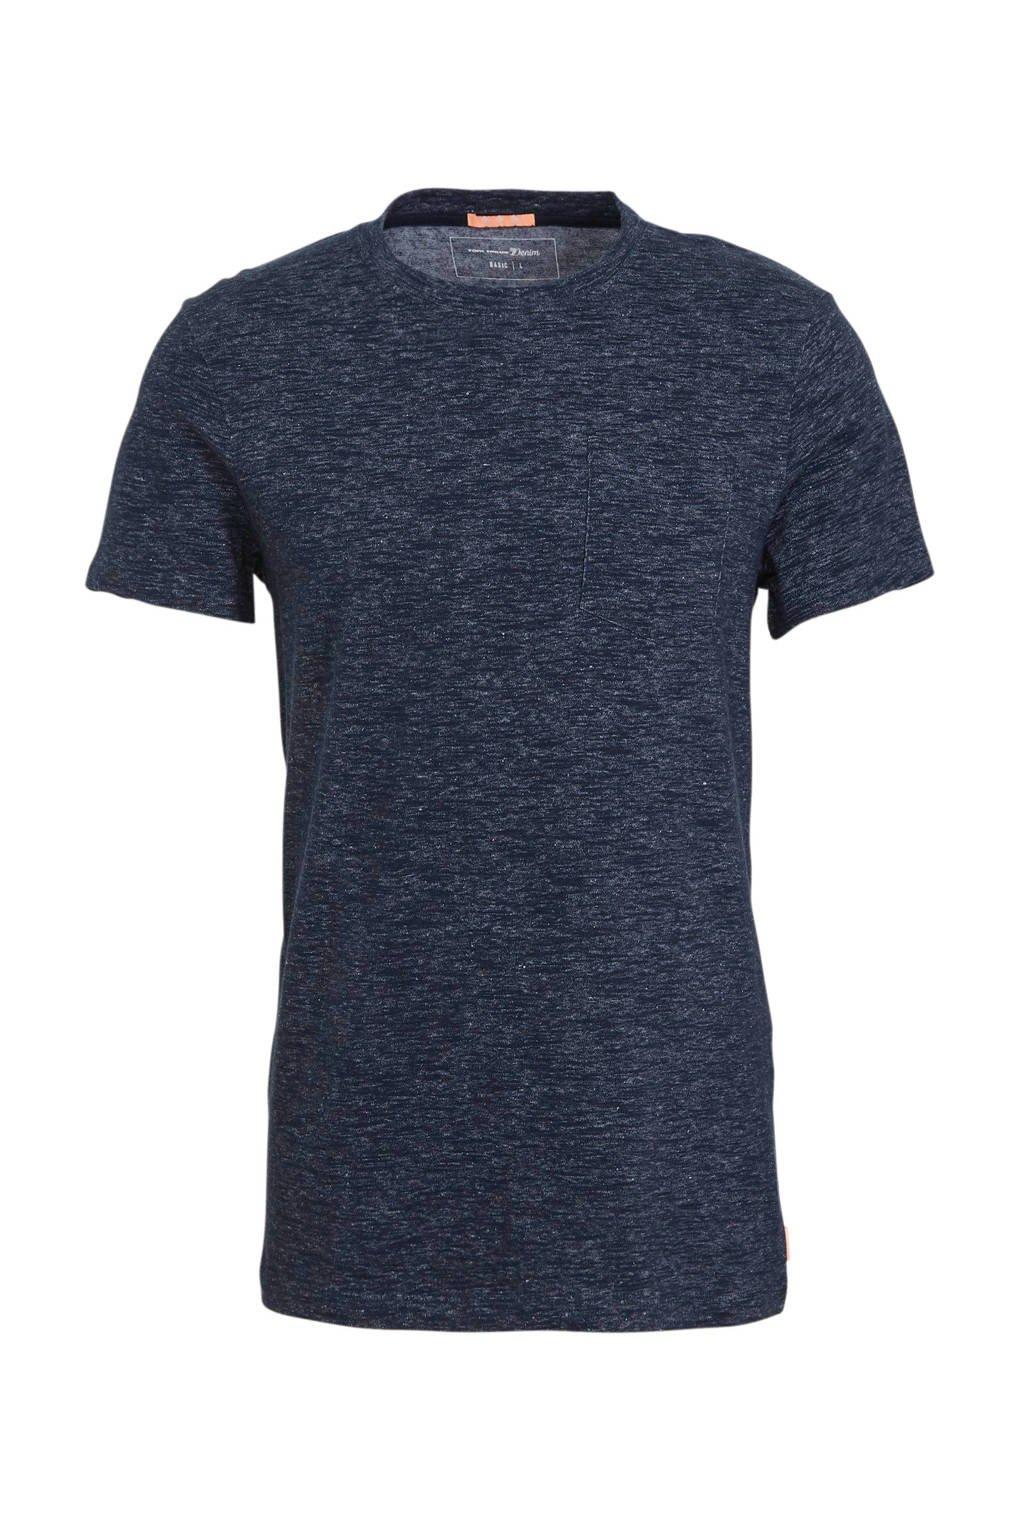 Tom Tailor gemêleerd T-shirt donkerblauw, Donkerblauw